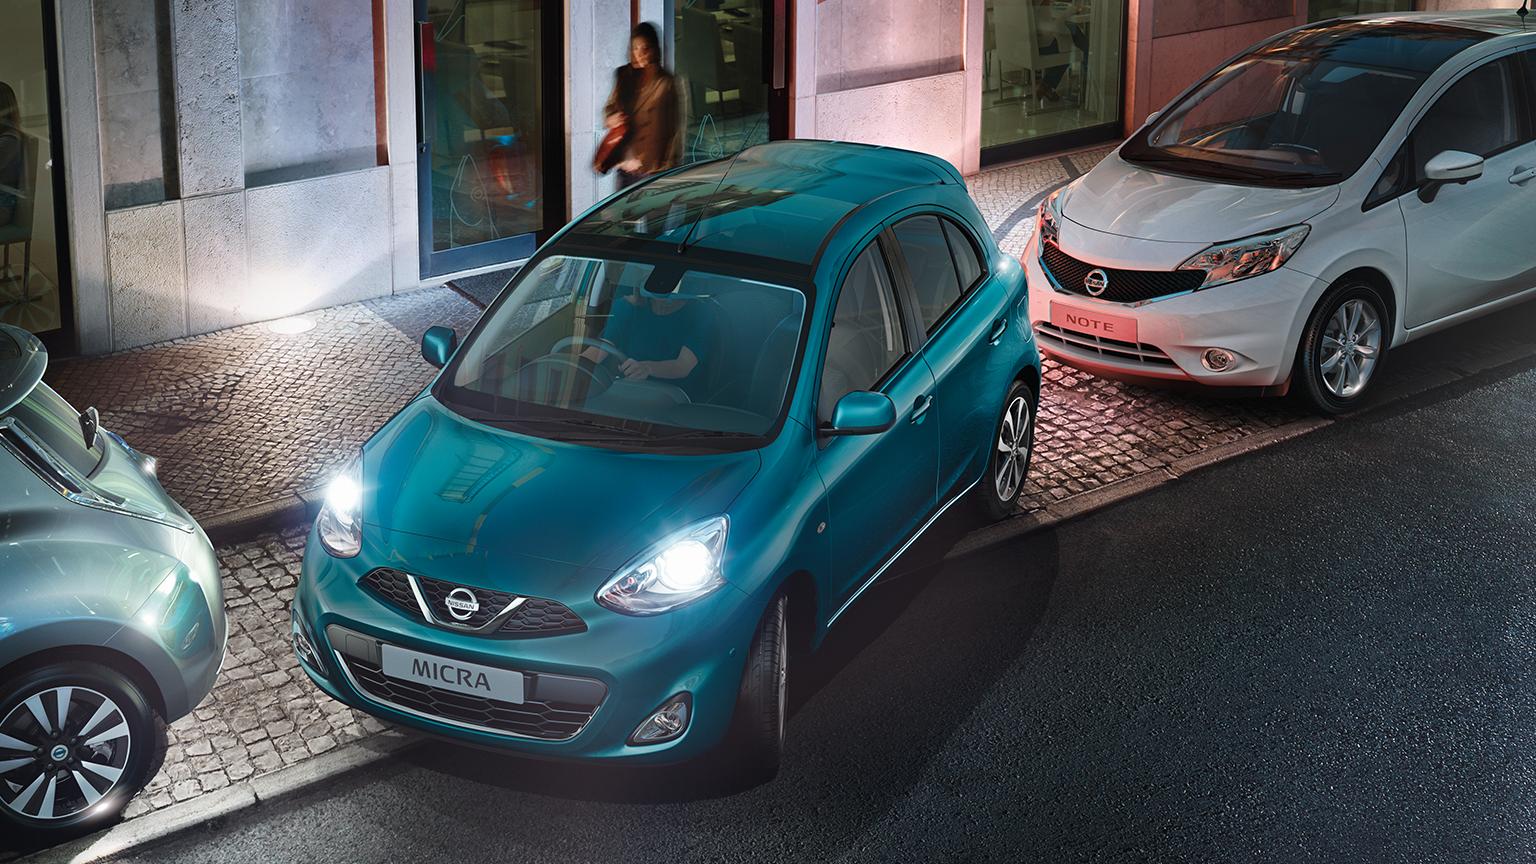 Nissan Micra | Rear parking sensors